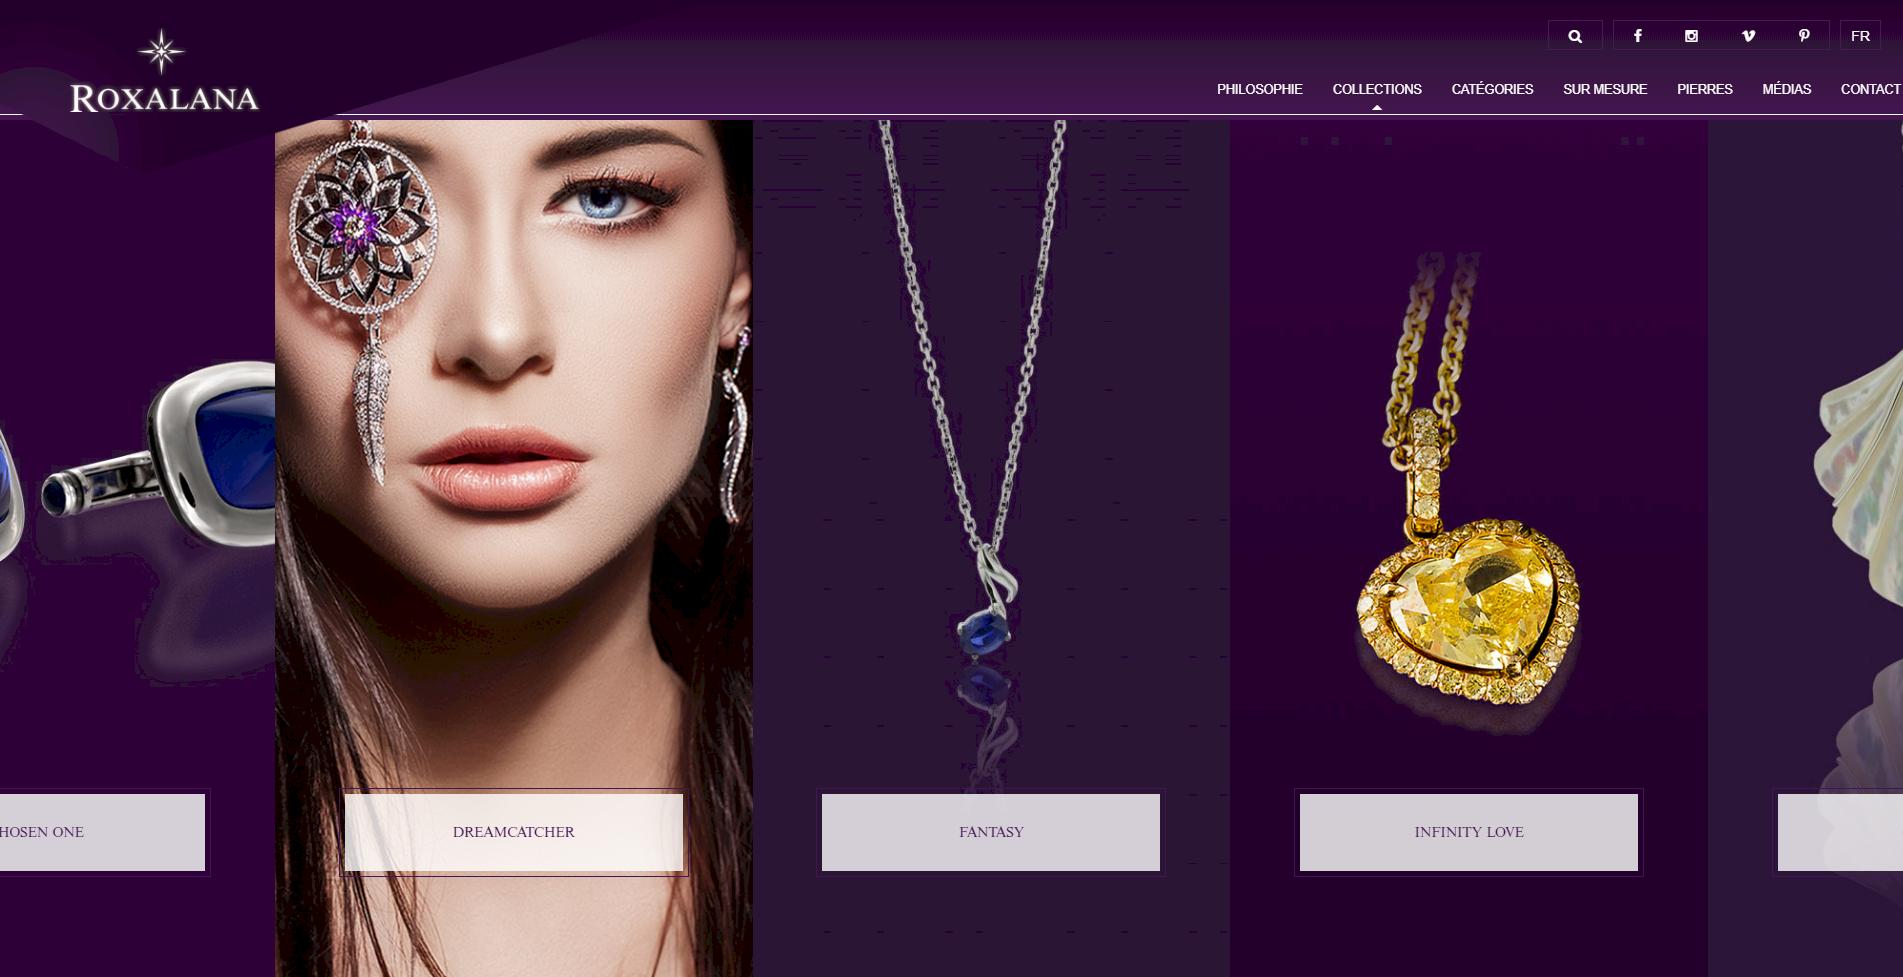 accueil roxalana kalfeutre webdesign lyon